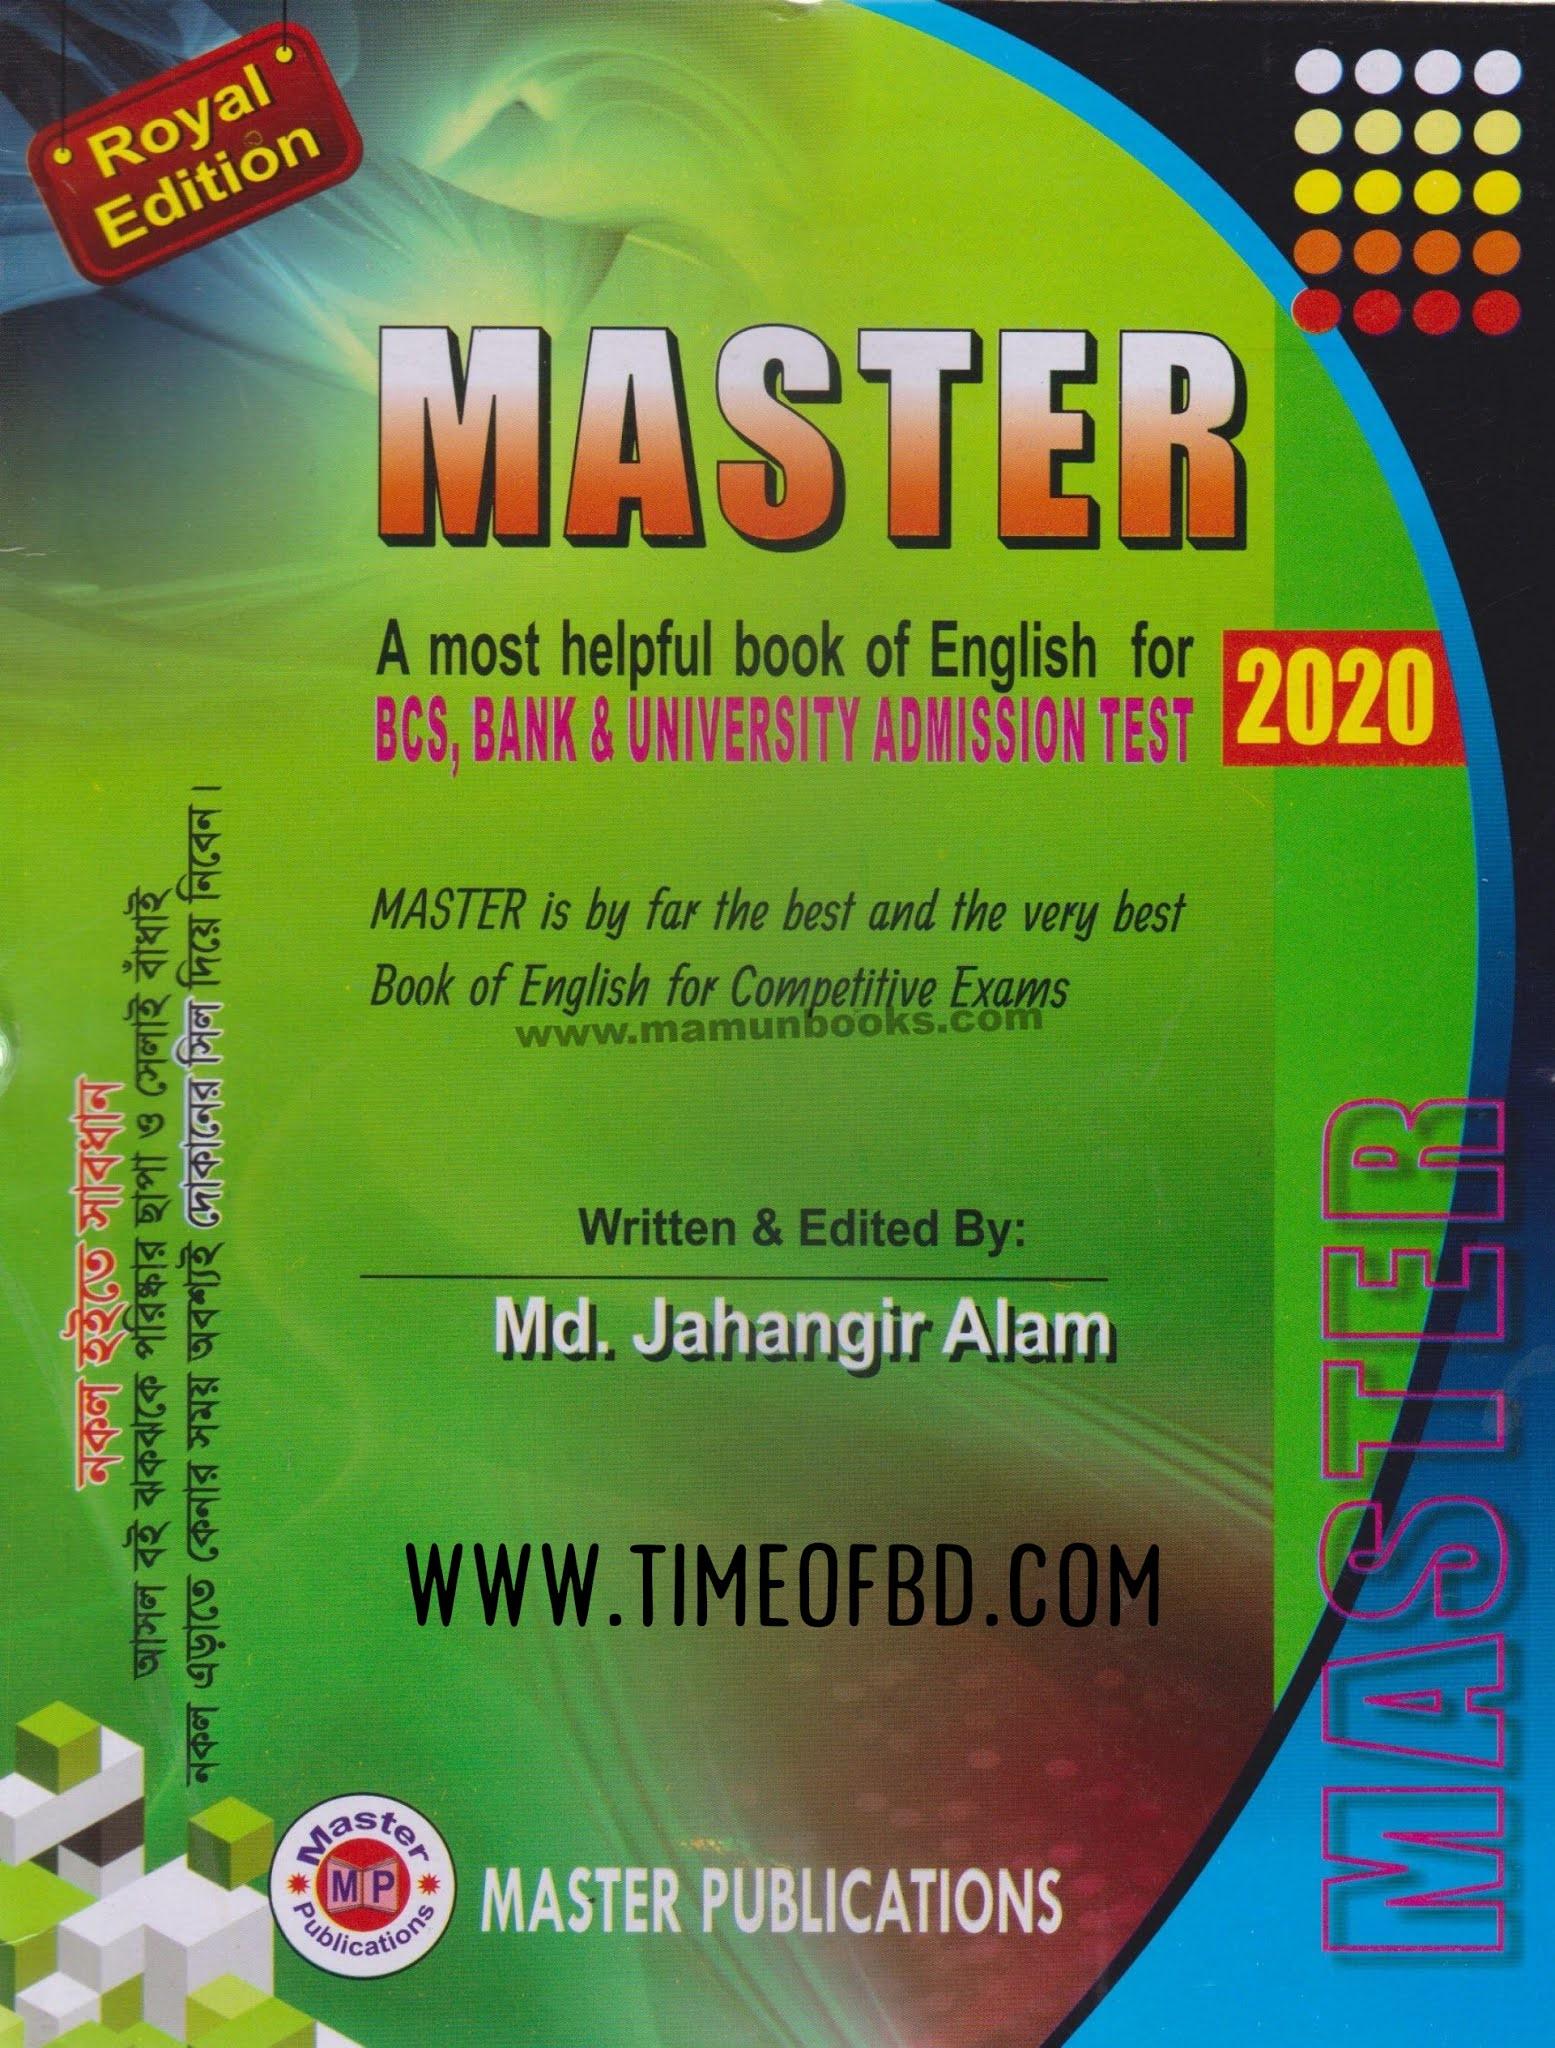 Master English Book, Master English book price, Master English book online order, Master English Book Details,মাস্টার ইংলিশ বুক প্রাইস,